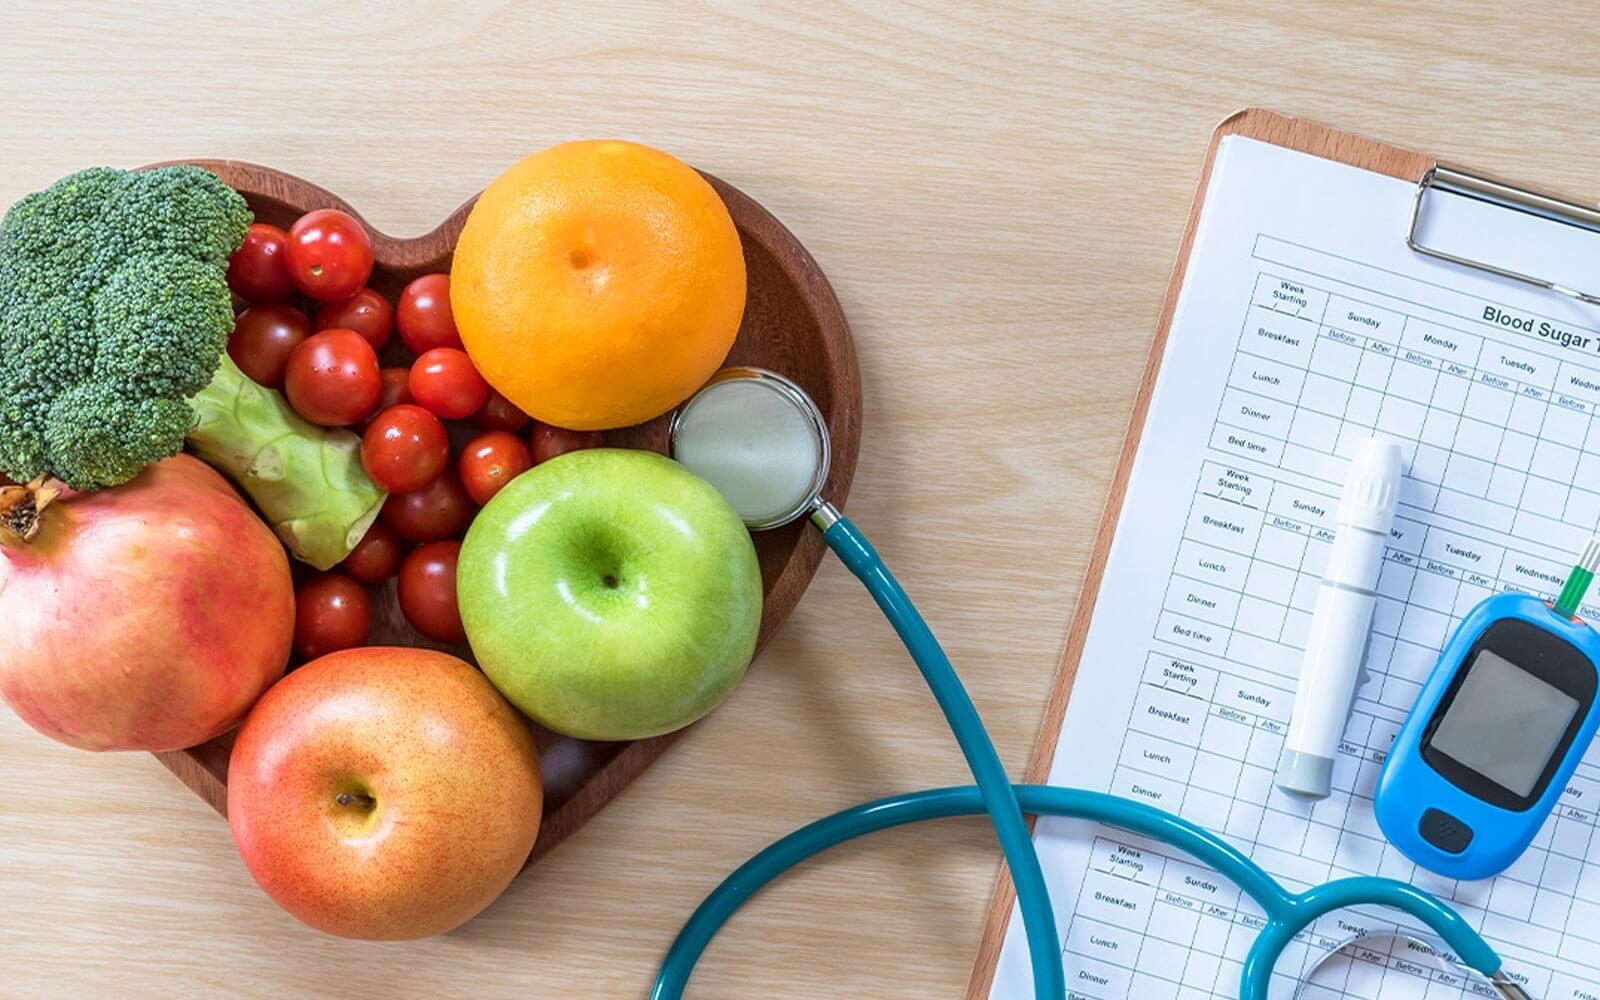 Diabetesi Harus Memenuhi 5 Nutrisi Penting Ini